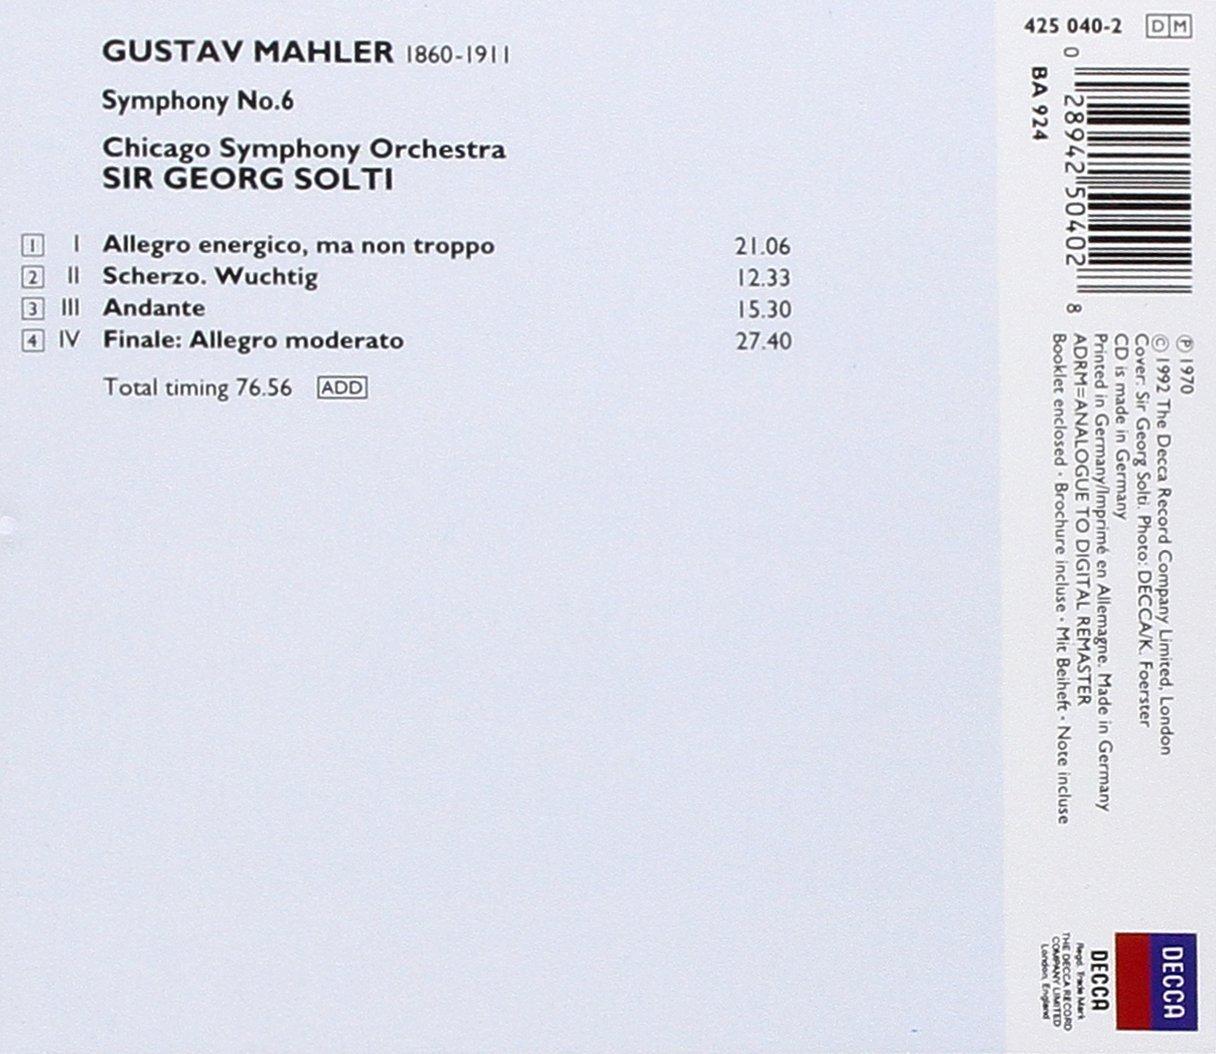 Gustav Mahler, Sir Georg Solti, Chicago Symphony Orchestra - Symphony 6 -  Amazon.com Music